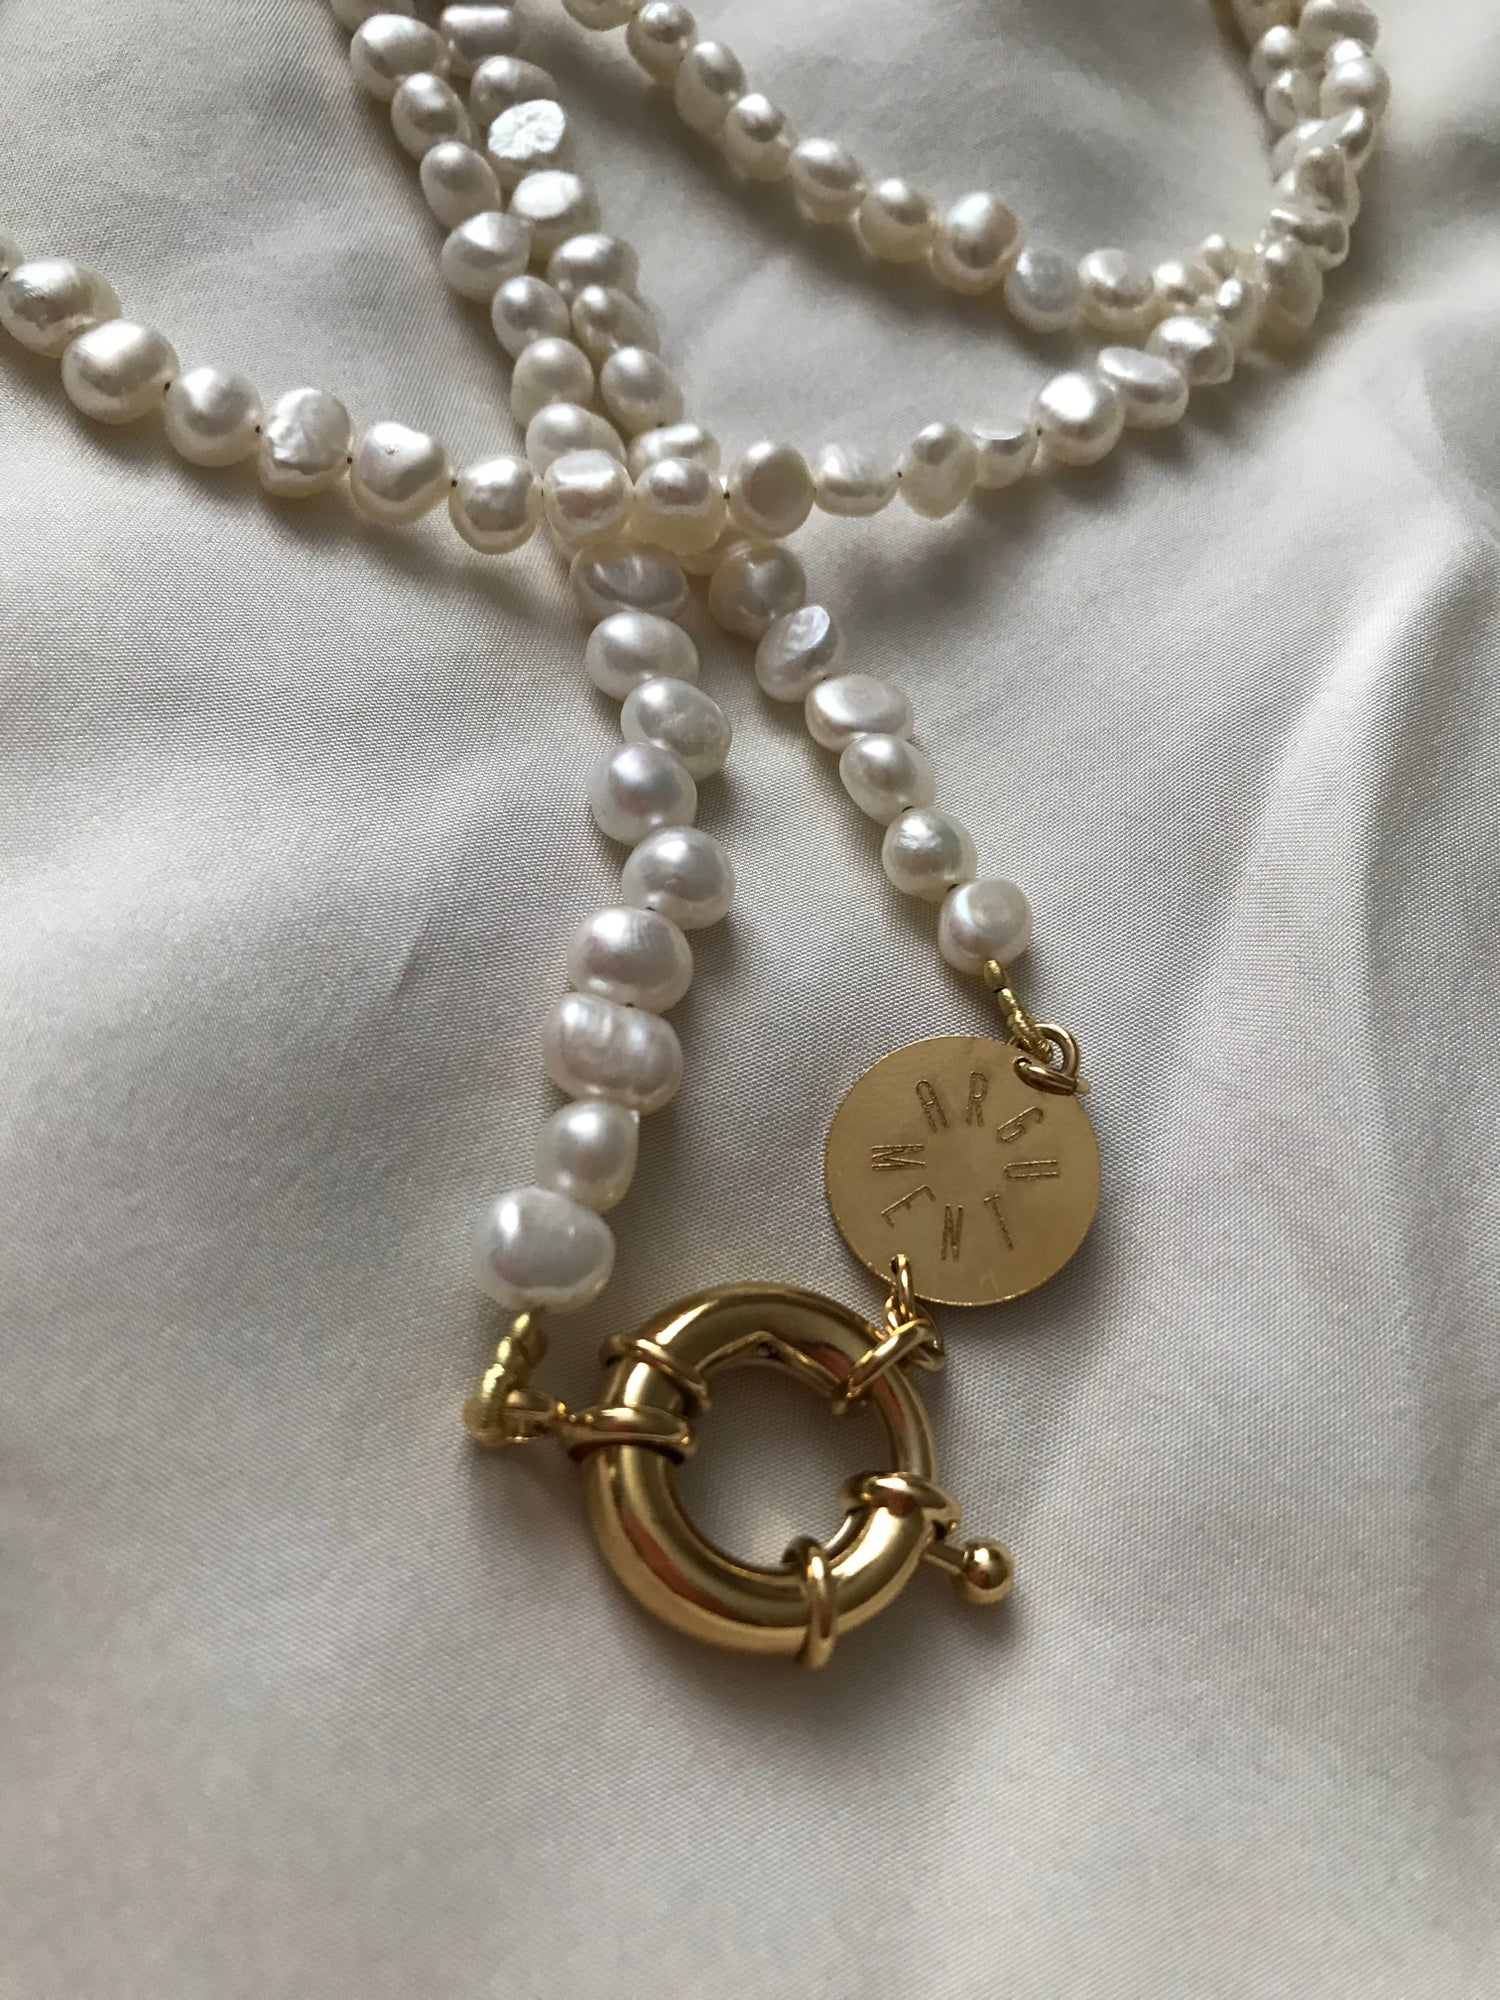 Image of COLLIER COURT perles de nacre